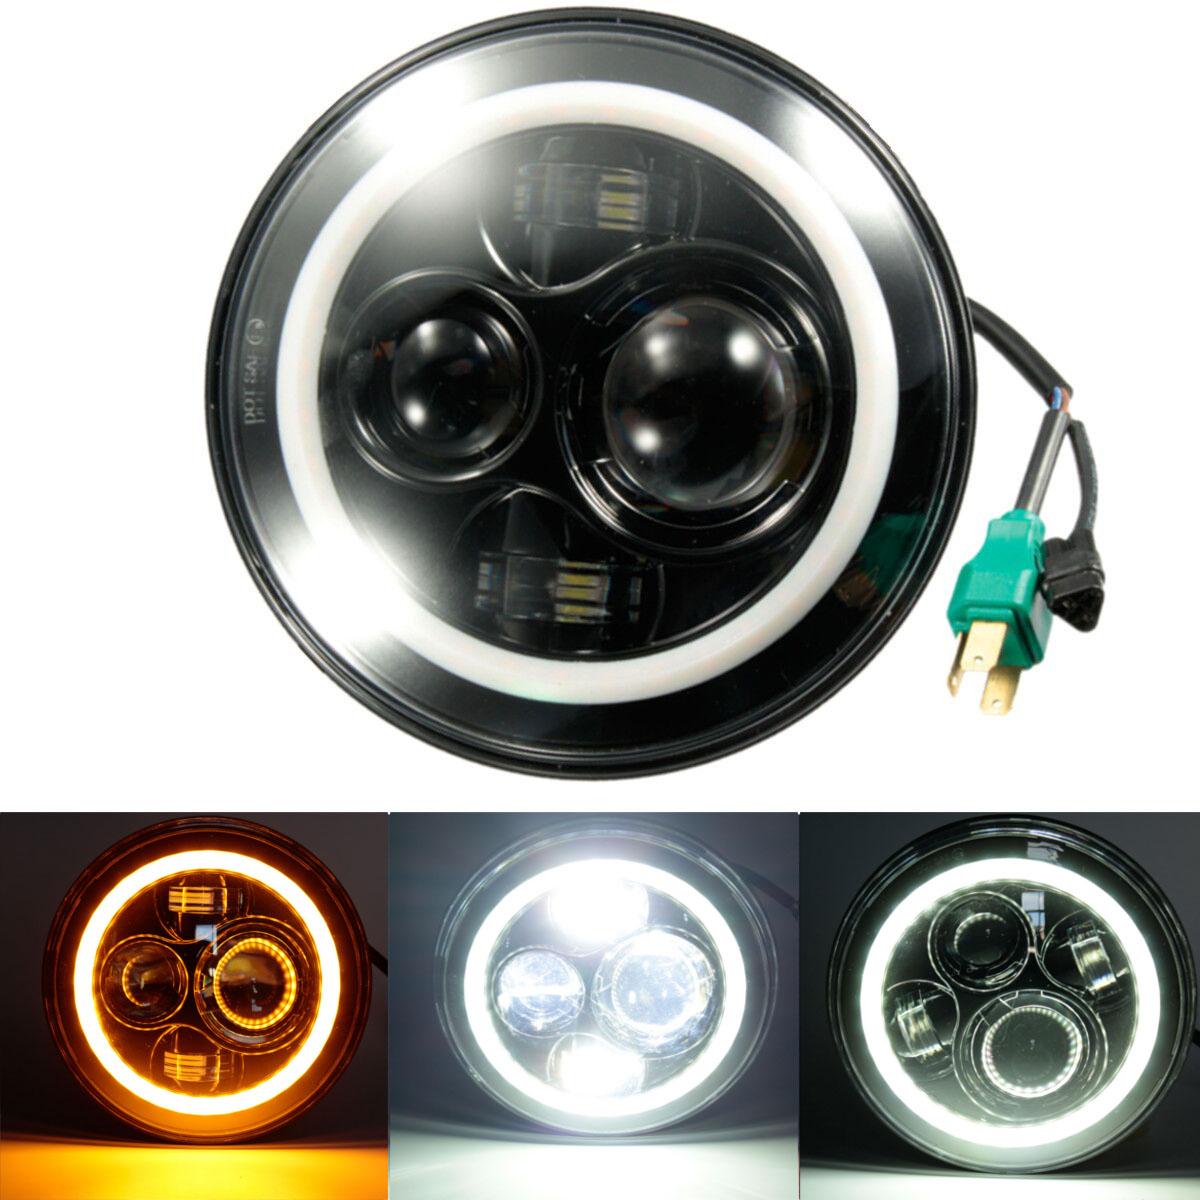 7 Inch Round Hi-Lo Beam Headlights Halo Angle Eyes For Jeep 97-15 Wrangler JK/TJ/LJ